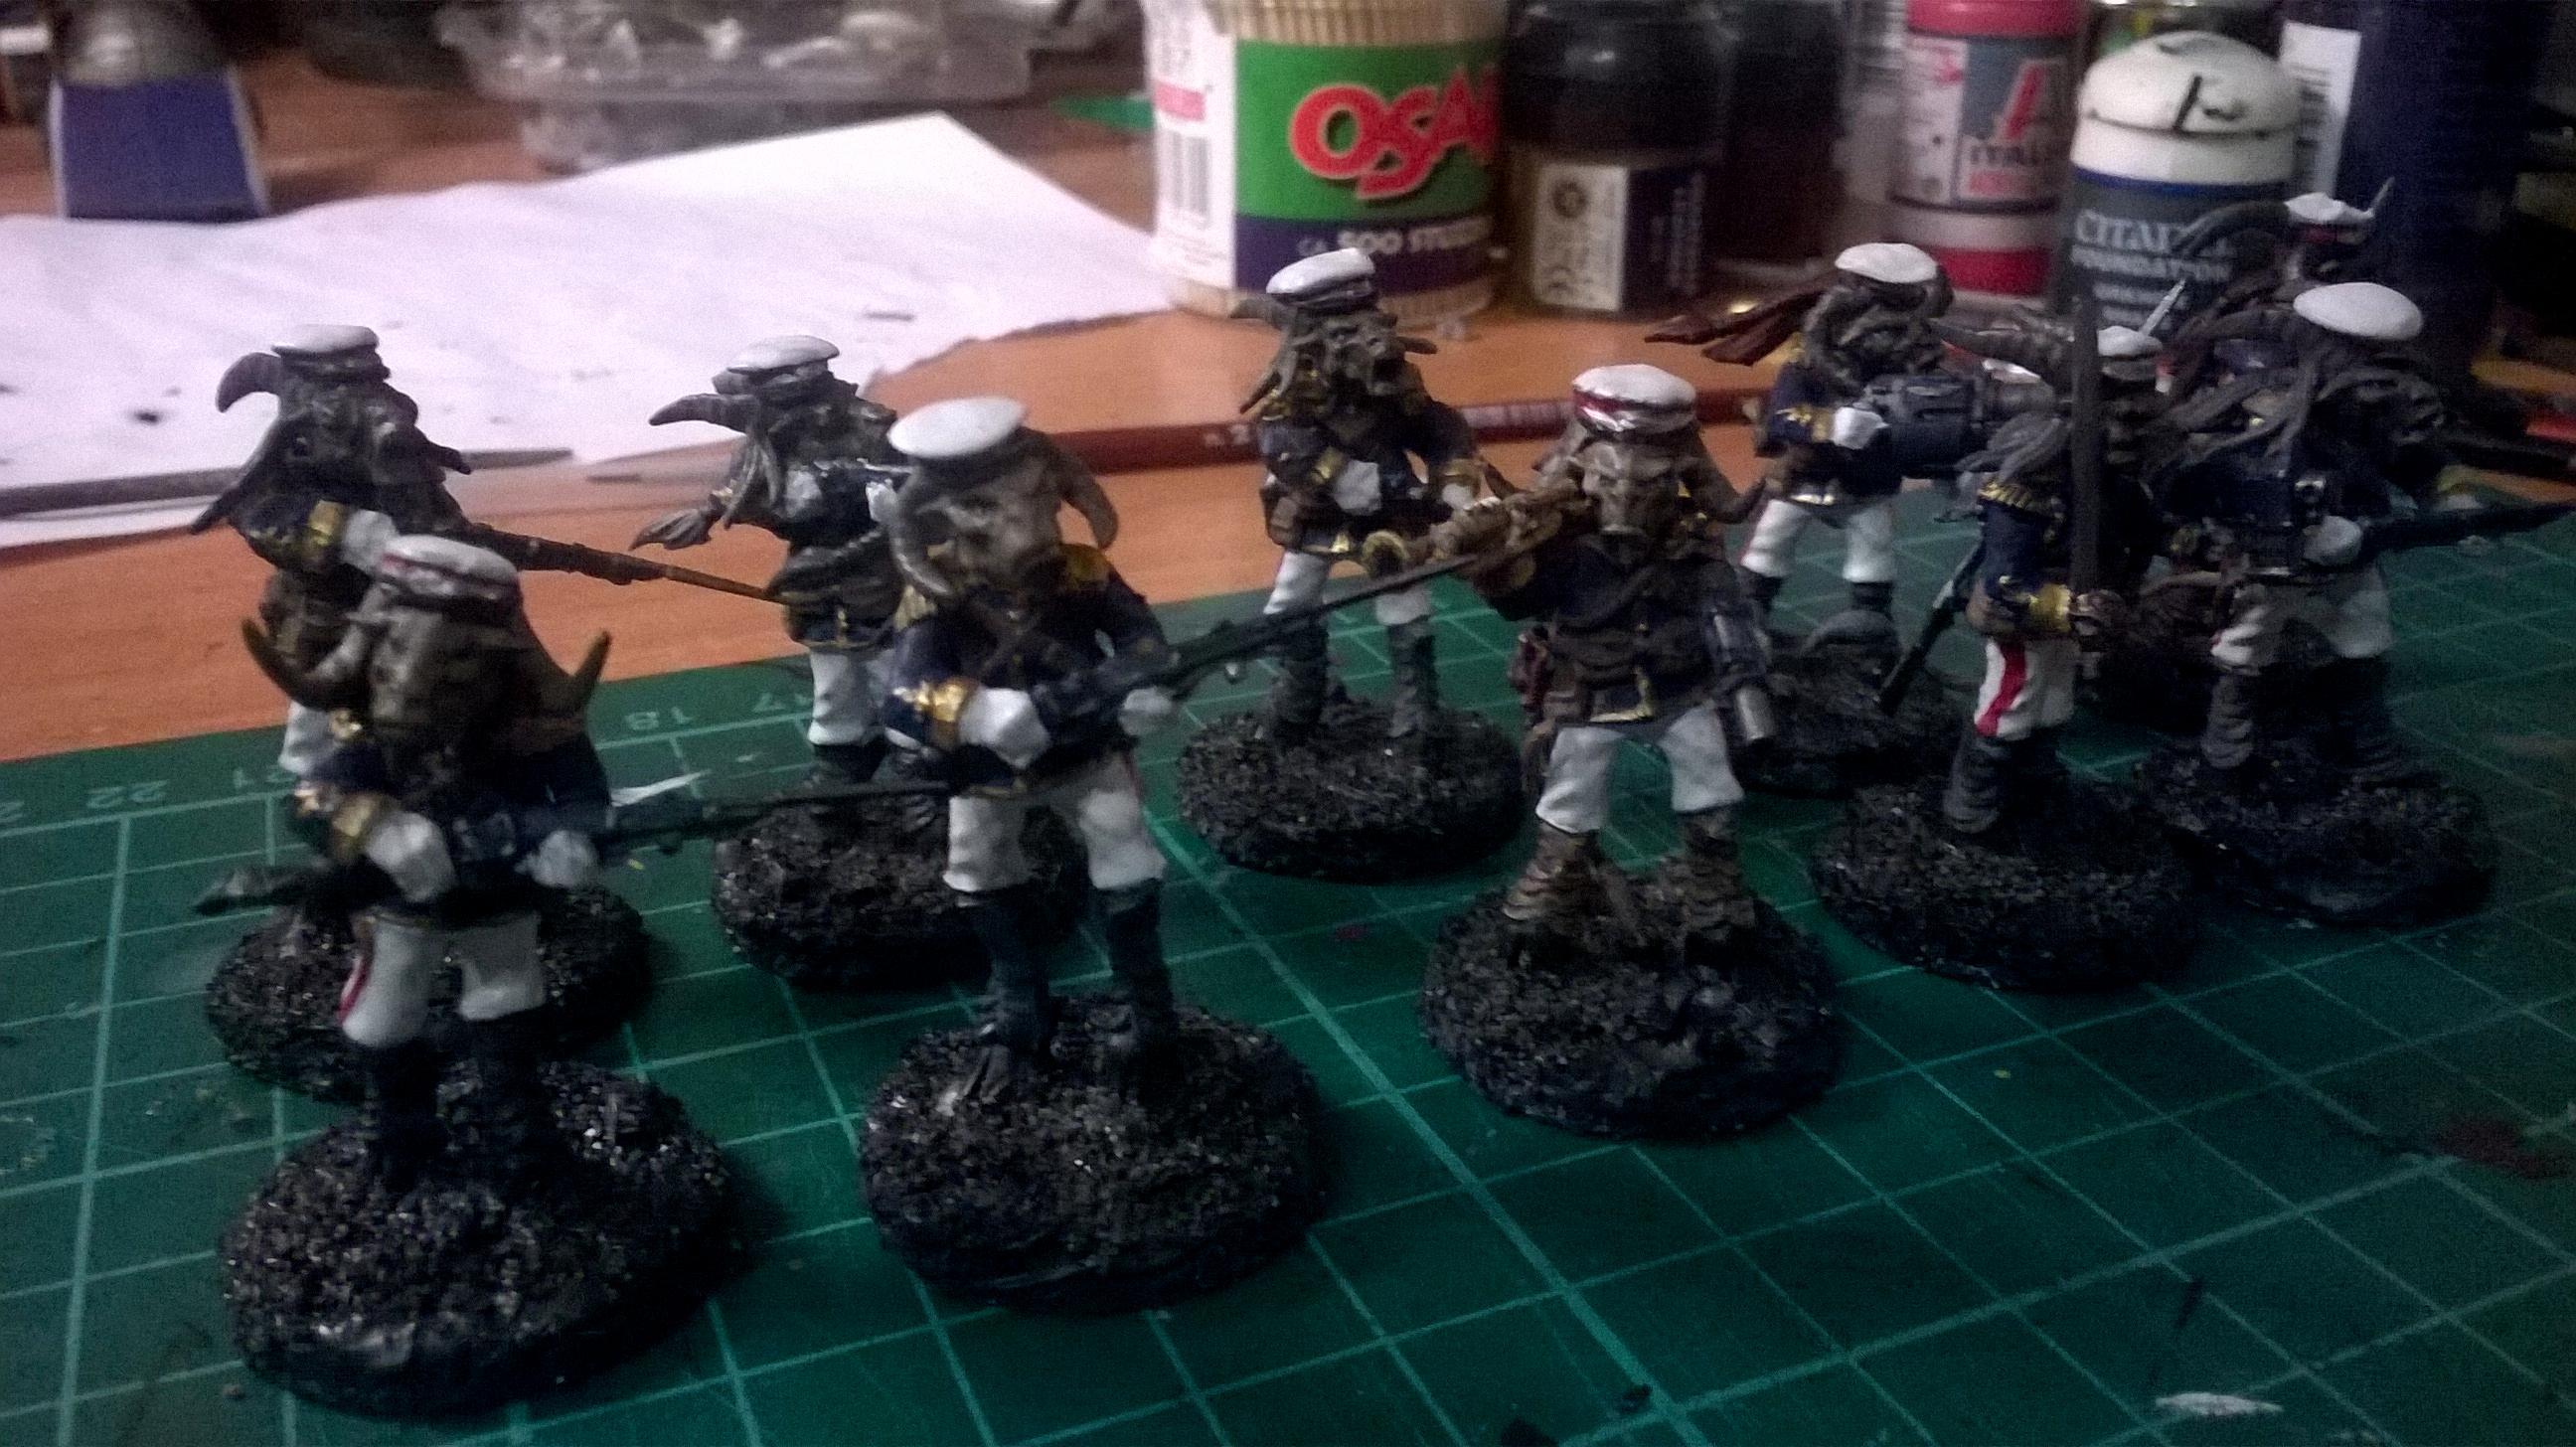 Astra Militarum, Beastmen, Bestigor, Conversion, Imperial Guard